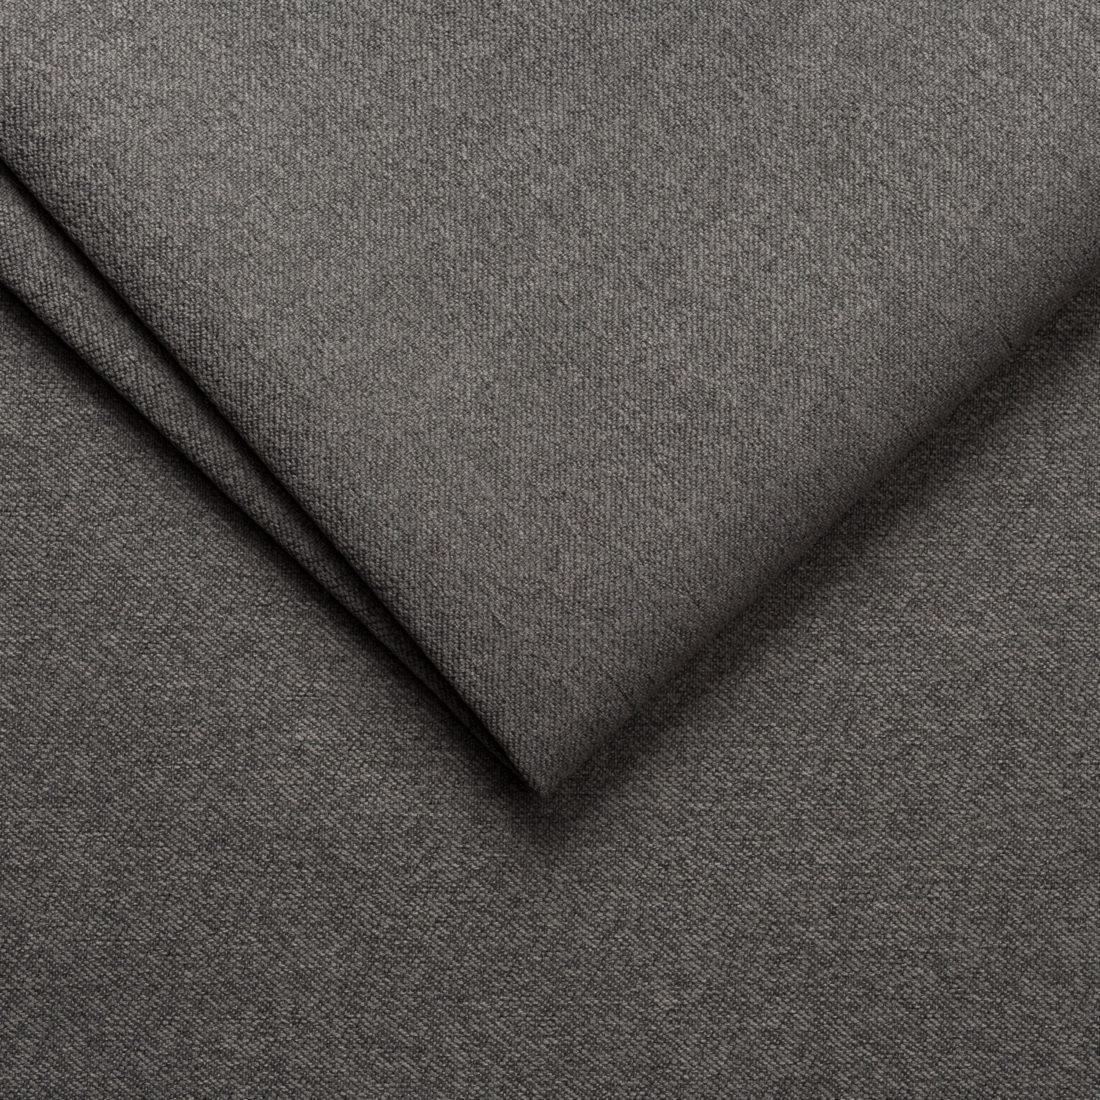 Мебельная ткань Evolution 5 Stone, жаккард